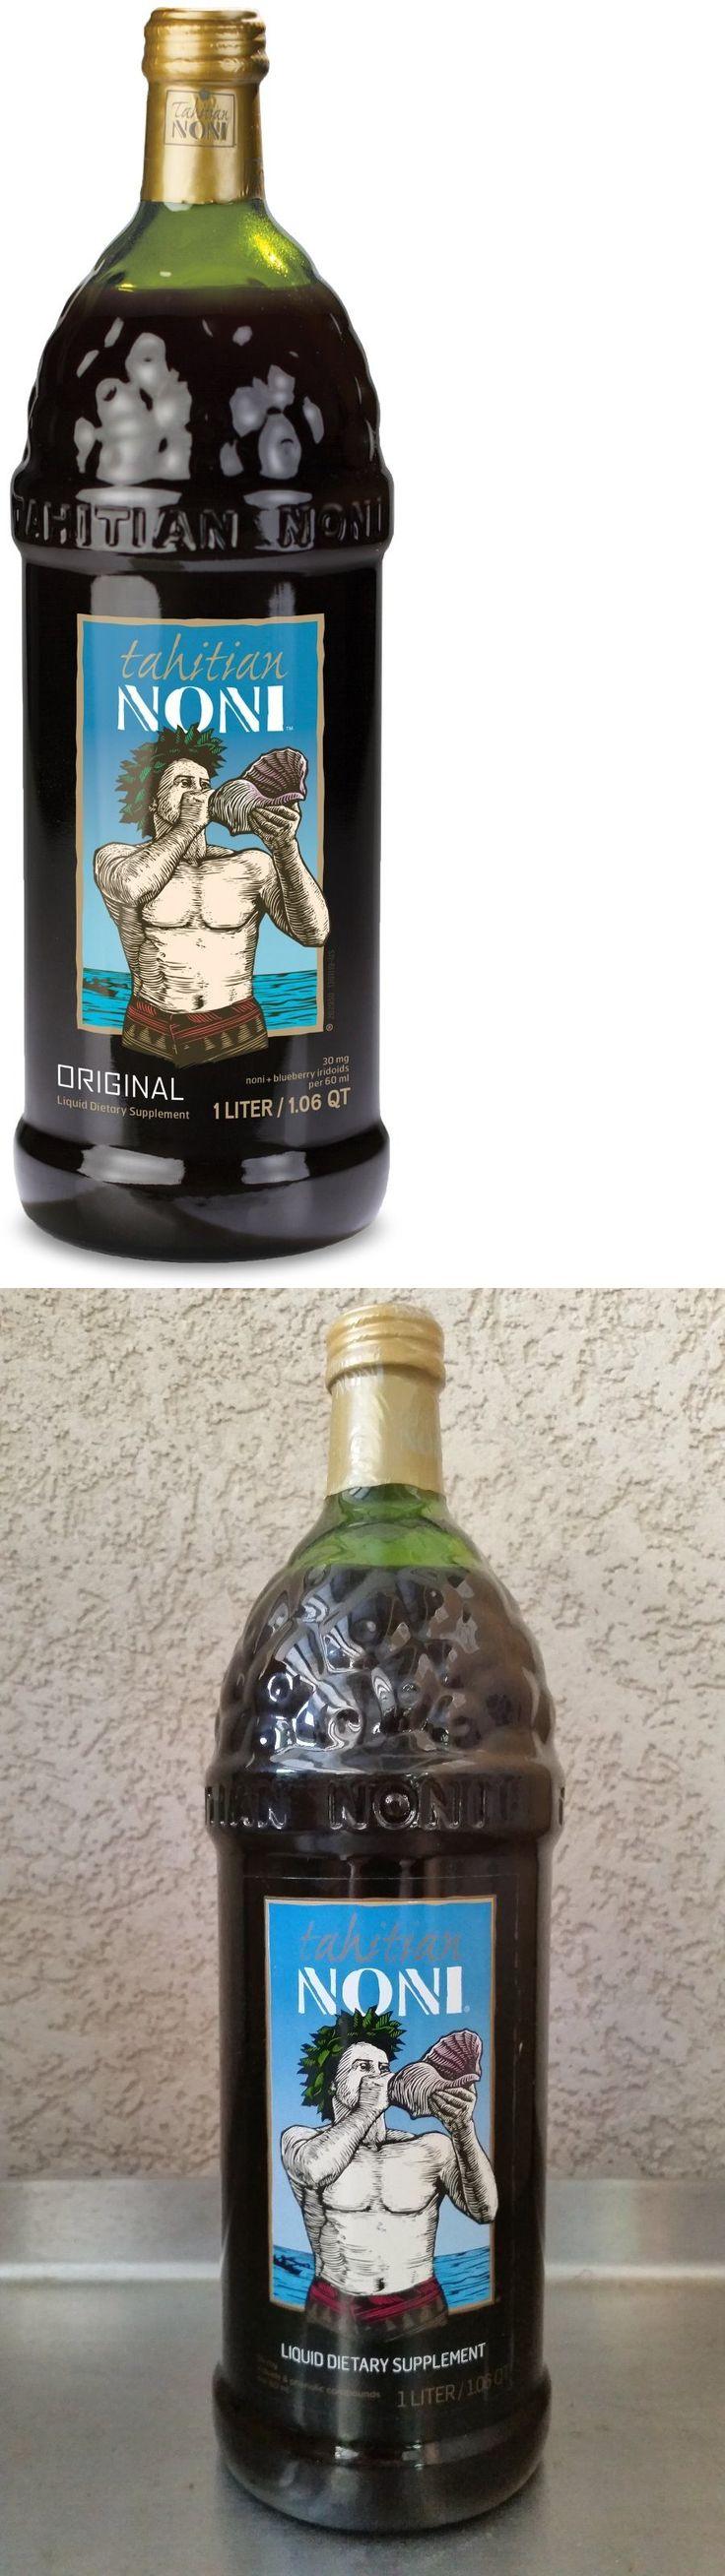 Energy Bars Shakes and Drinks: Tahitian Noni Juice (4) 1 Liter Bottle Case Of Tahitian Noni ® New Morinda Tni -> BUY IT NOW ONLY: $94 on eBay!